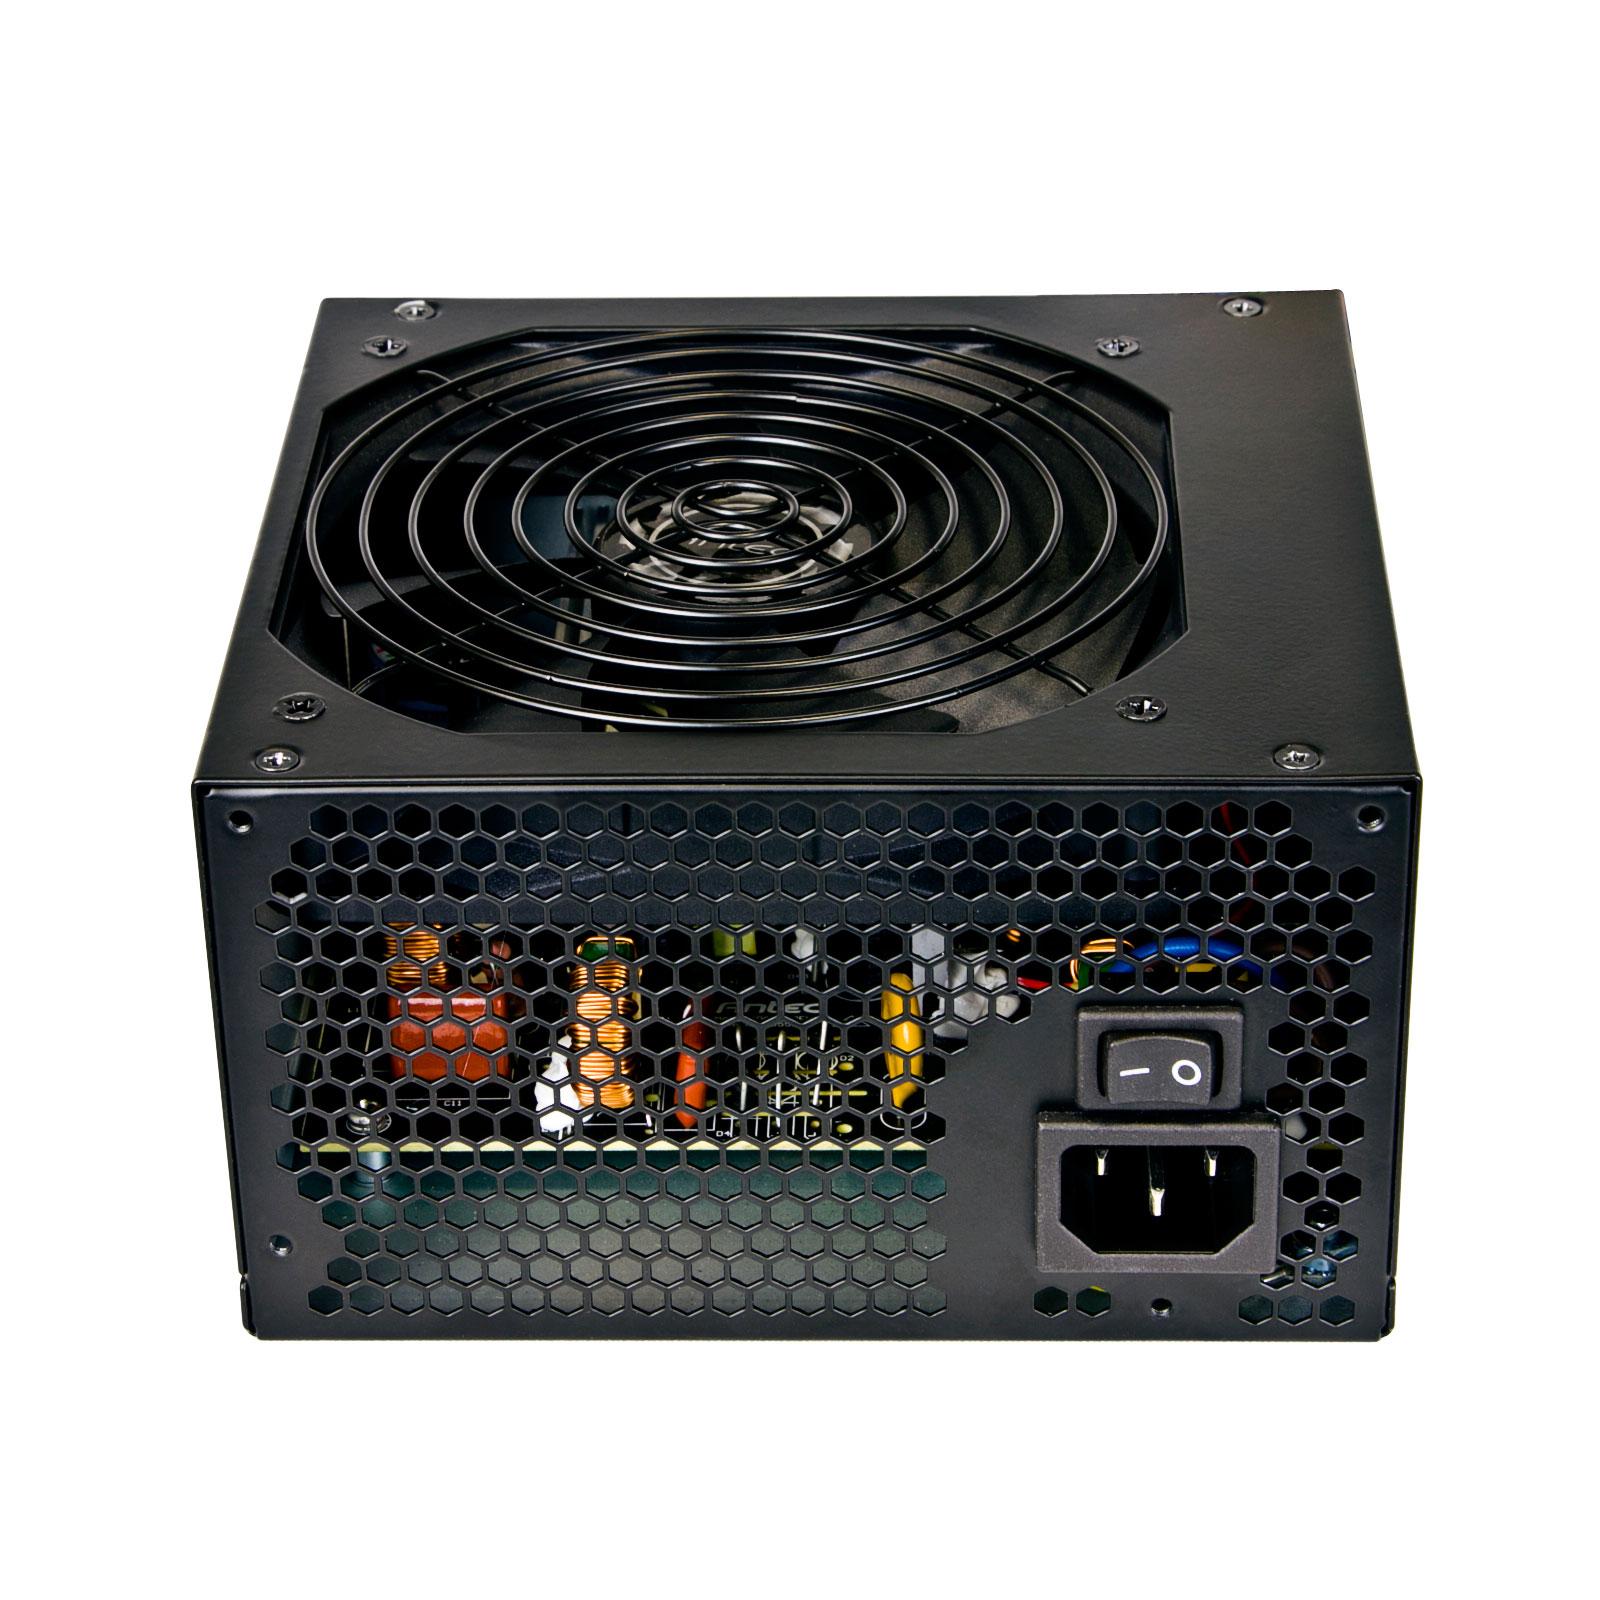 Alimentation PC Antec VP 600P Alimentation 600 Watts ATX12V 2.4 (garantie 2 ans par Antec)